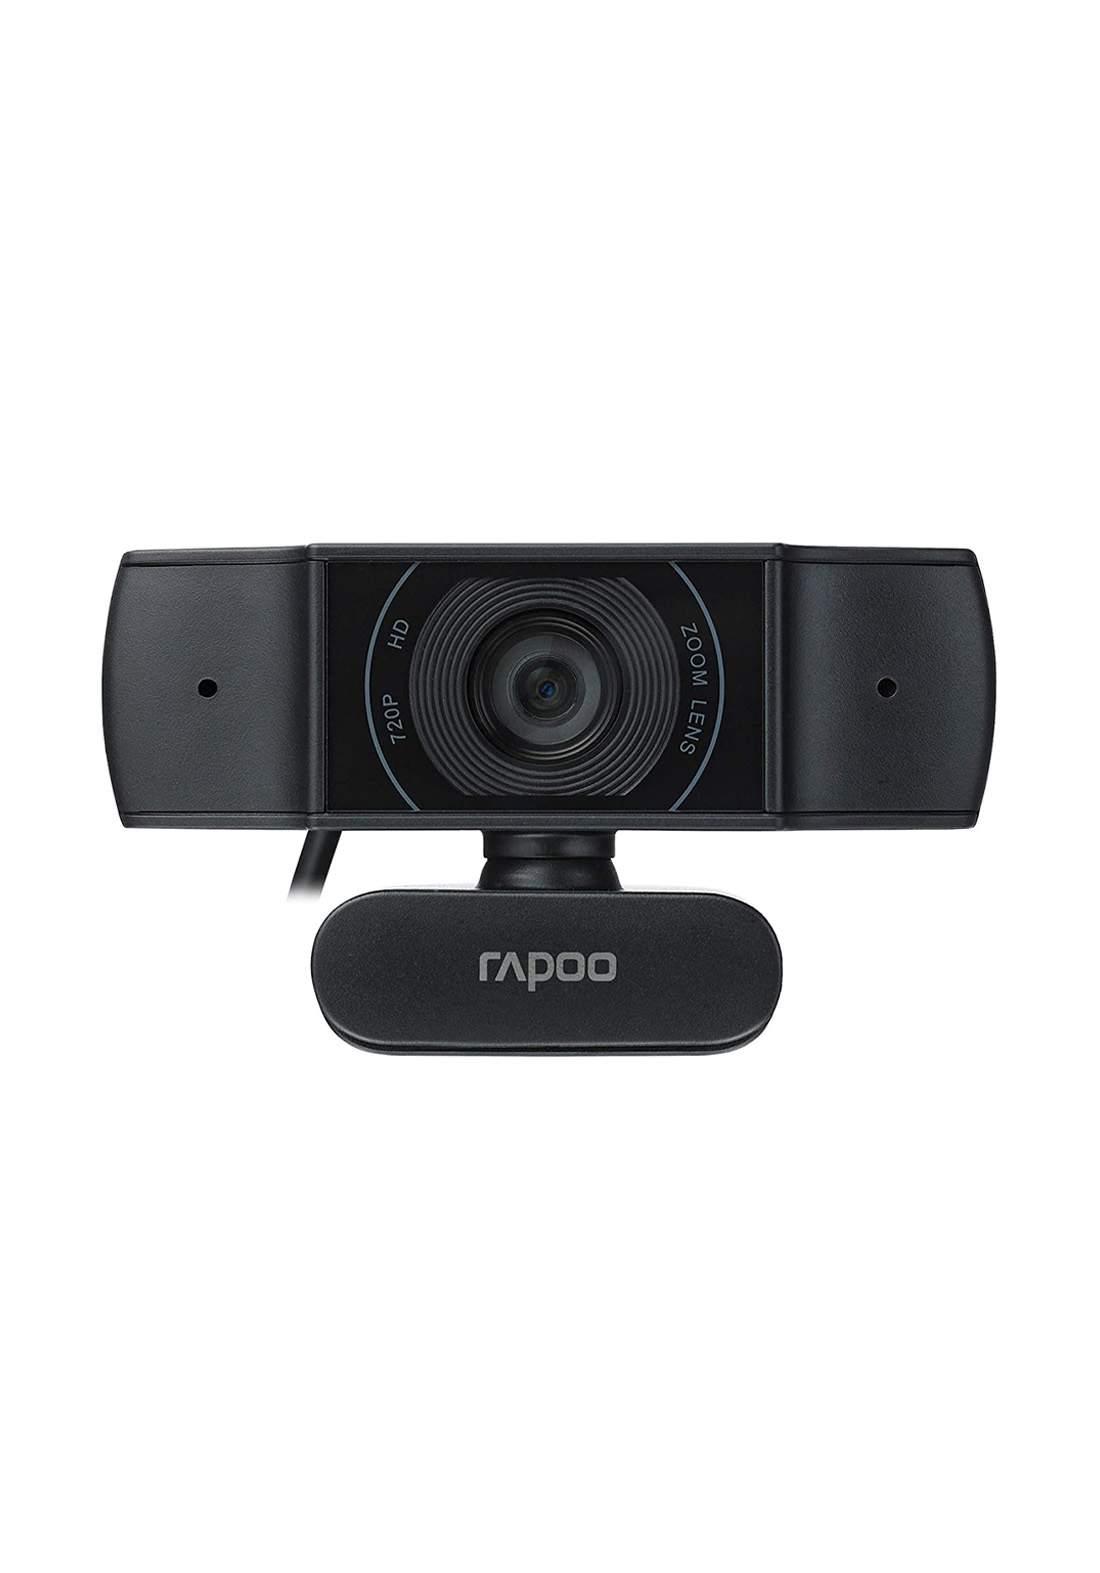 Rapoo C200 720p HD USB  Webcam with Microphone - Black كاميرا